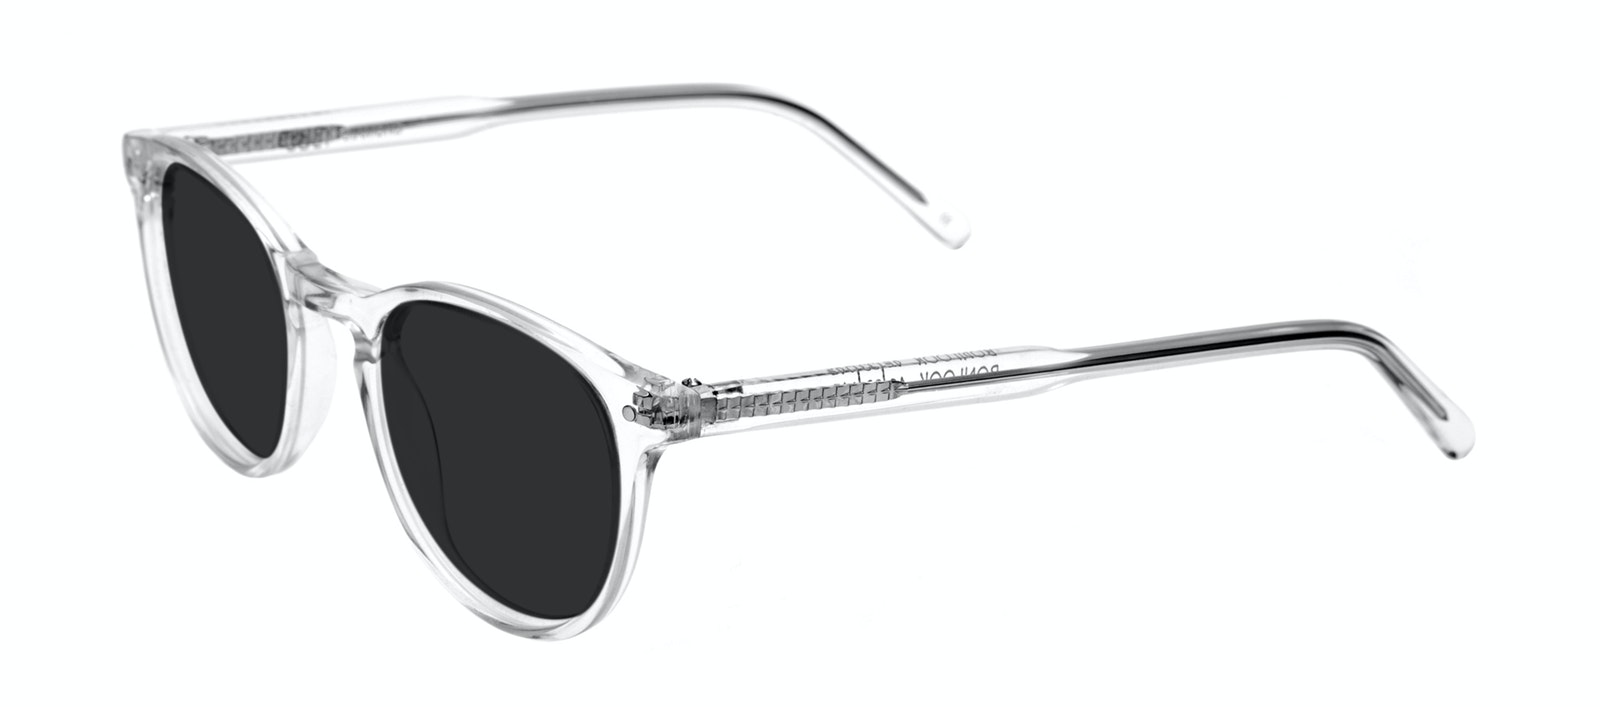 Affordable Fashion Glasses Round Sunglasses Men Cult Diamond Tilt